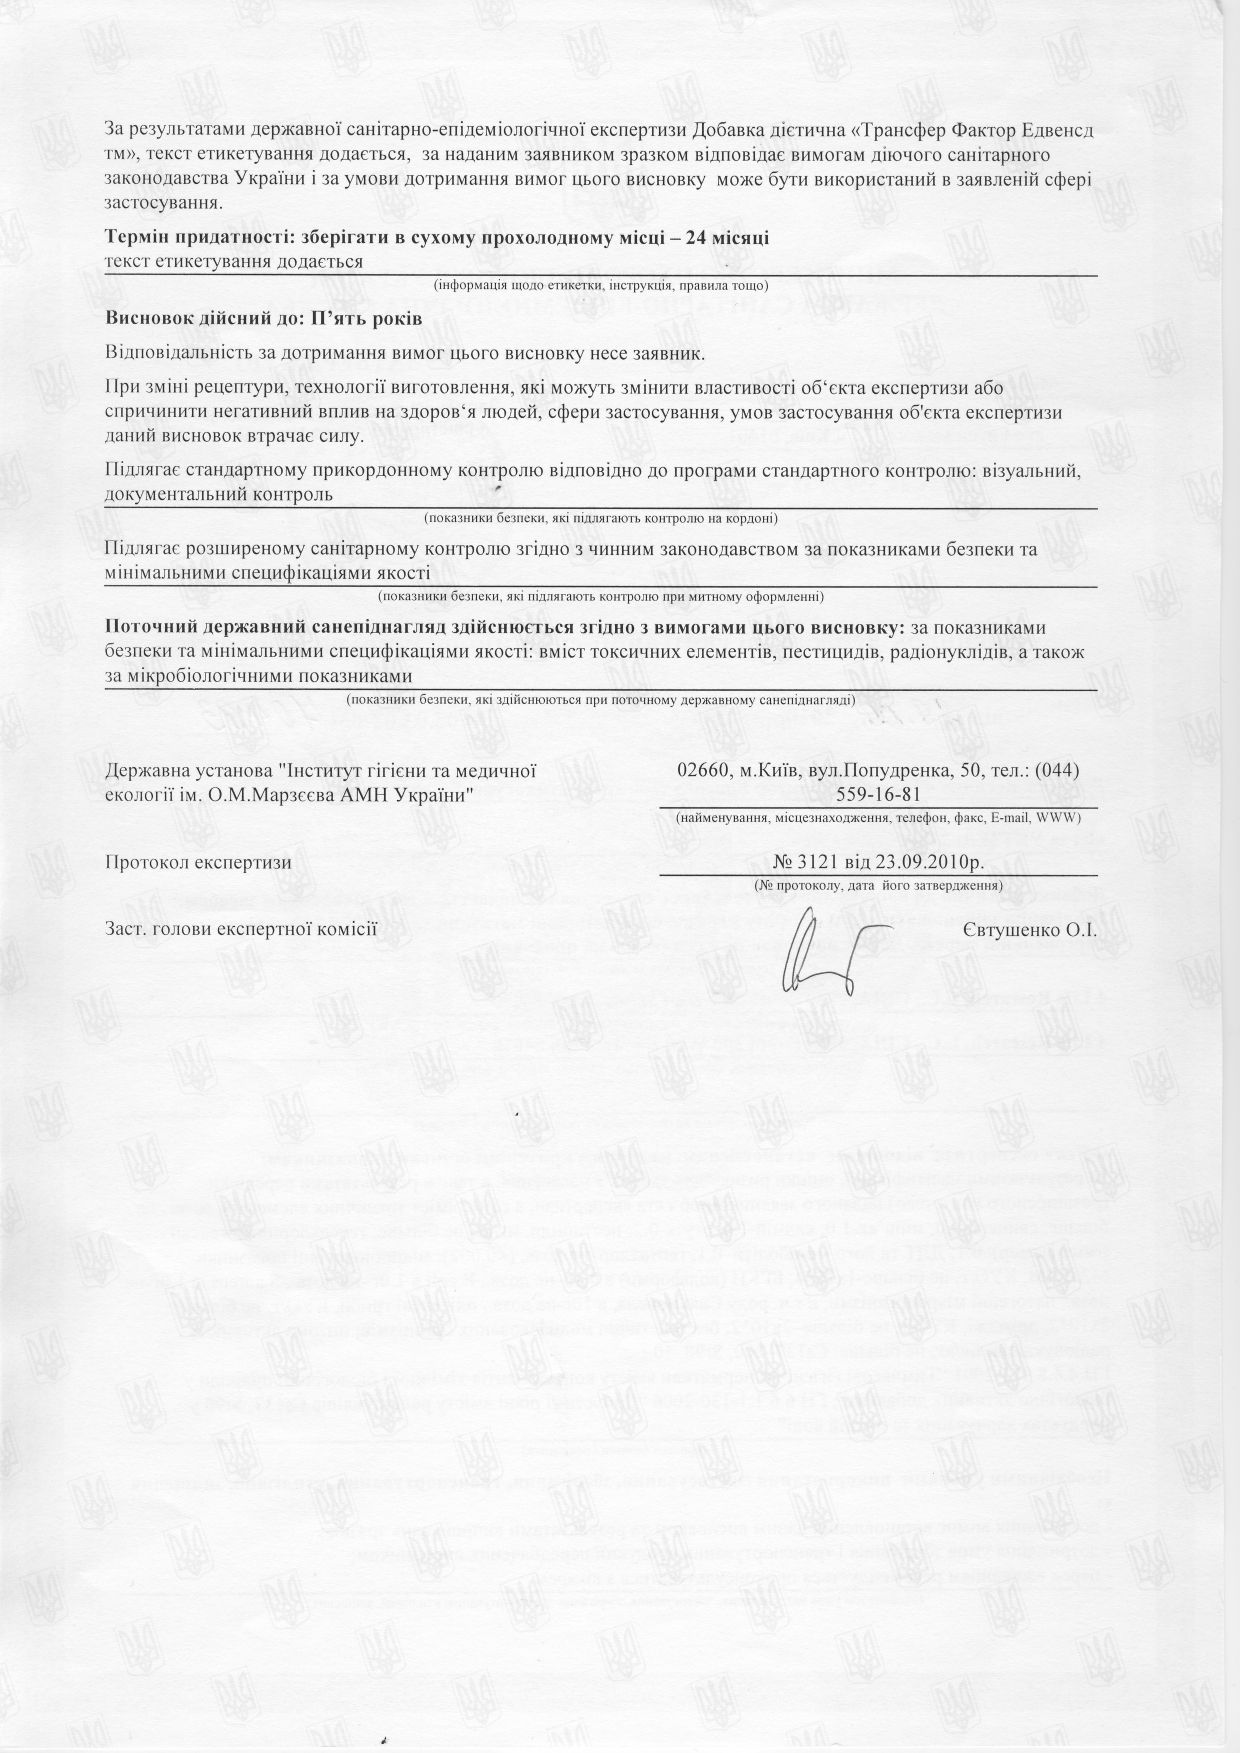 Сертификат Трансфер-фактор эдвенсд, лист 2